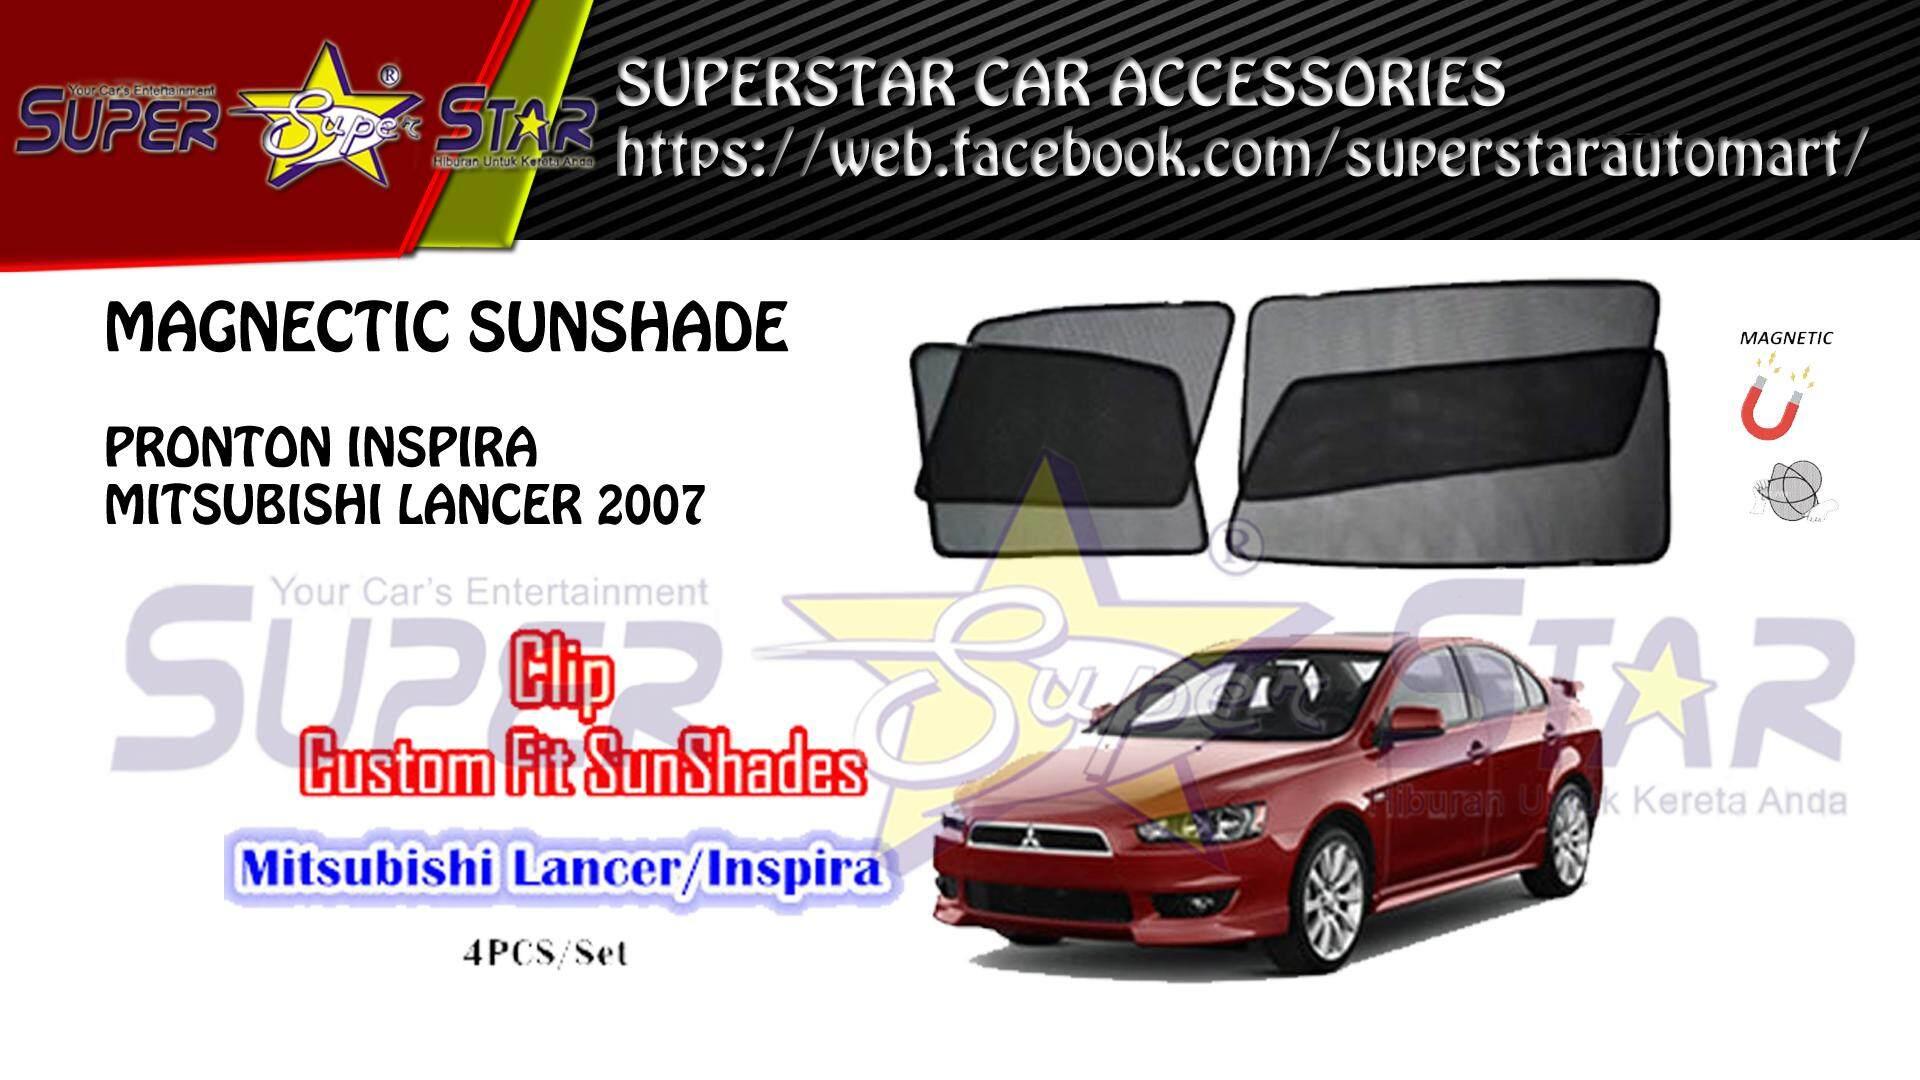 CARFIT MAGNET SHADE SUNSHADE FOR PROTON INSPIRA / LANCER 2007 (4PCS/SET)